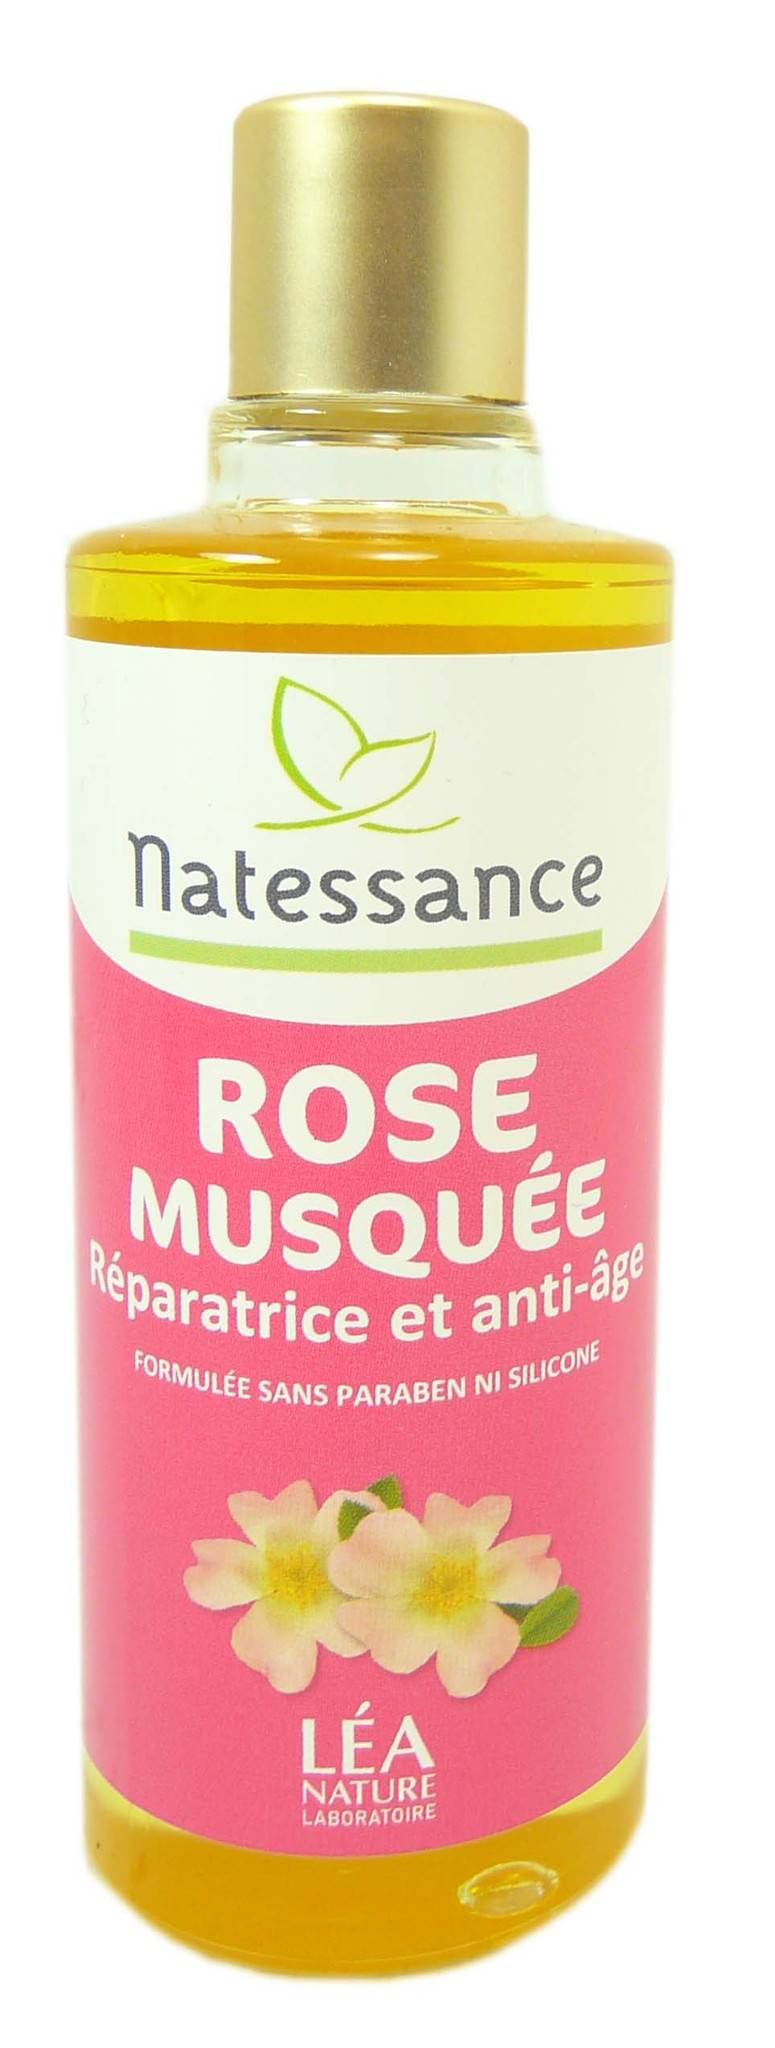 Natessance huile rose de musquee 100ml